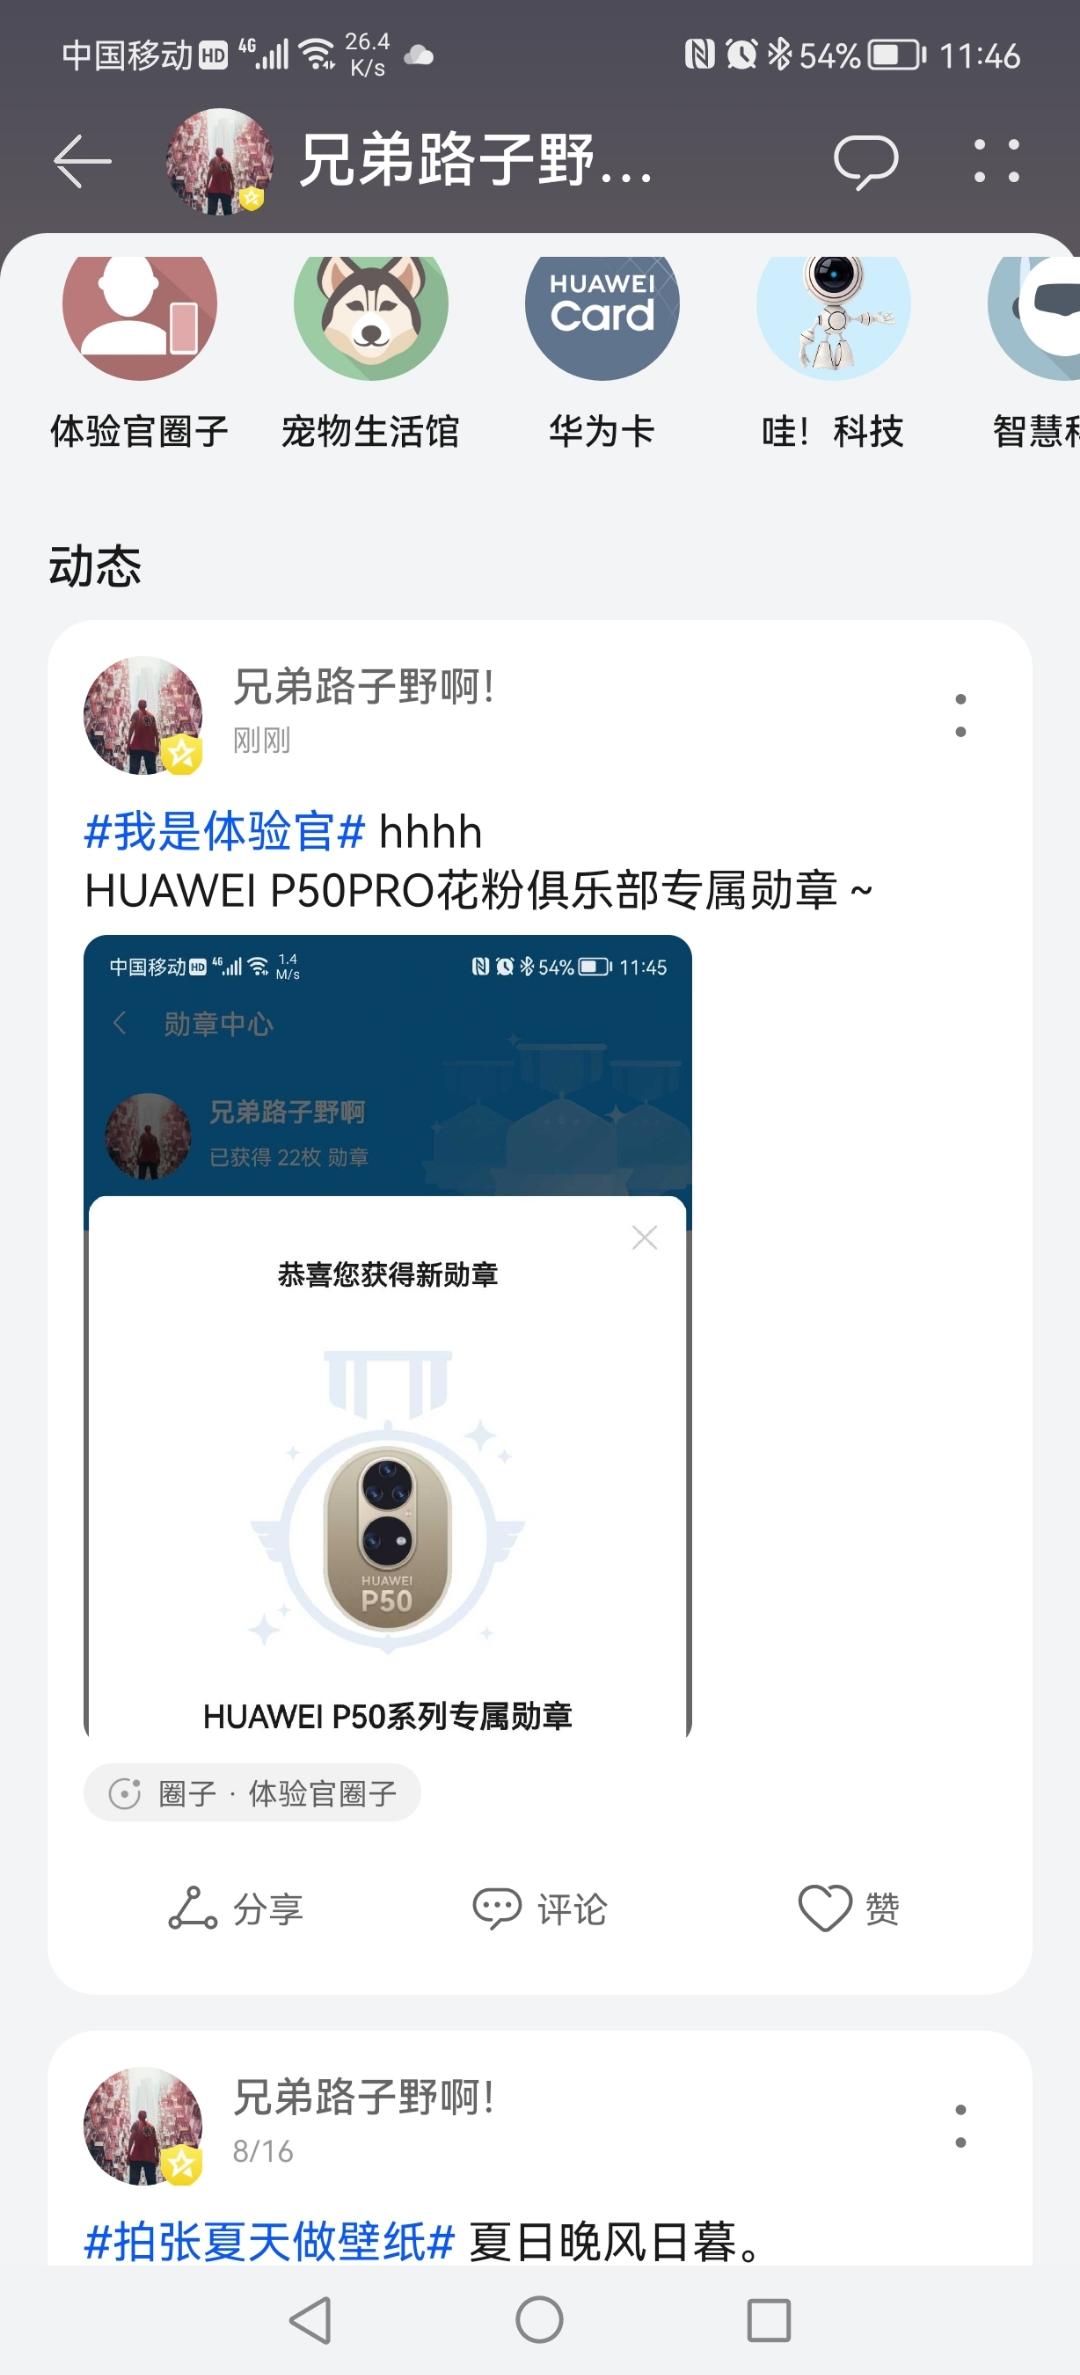 Screenshot_20210823_114630_com.huawei.mycenter.jpg